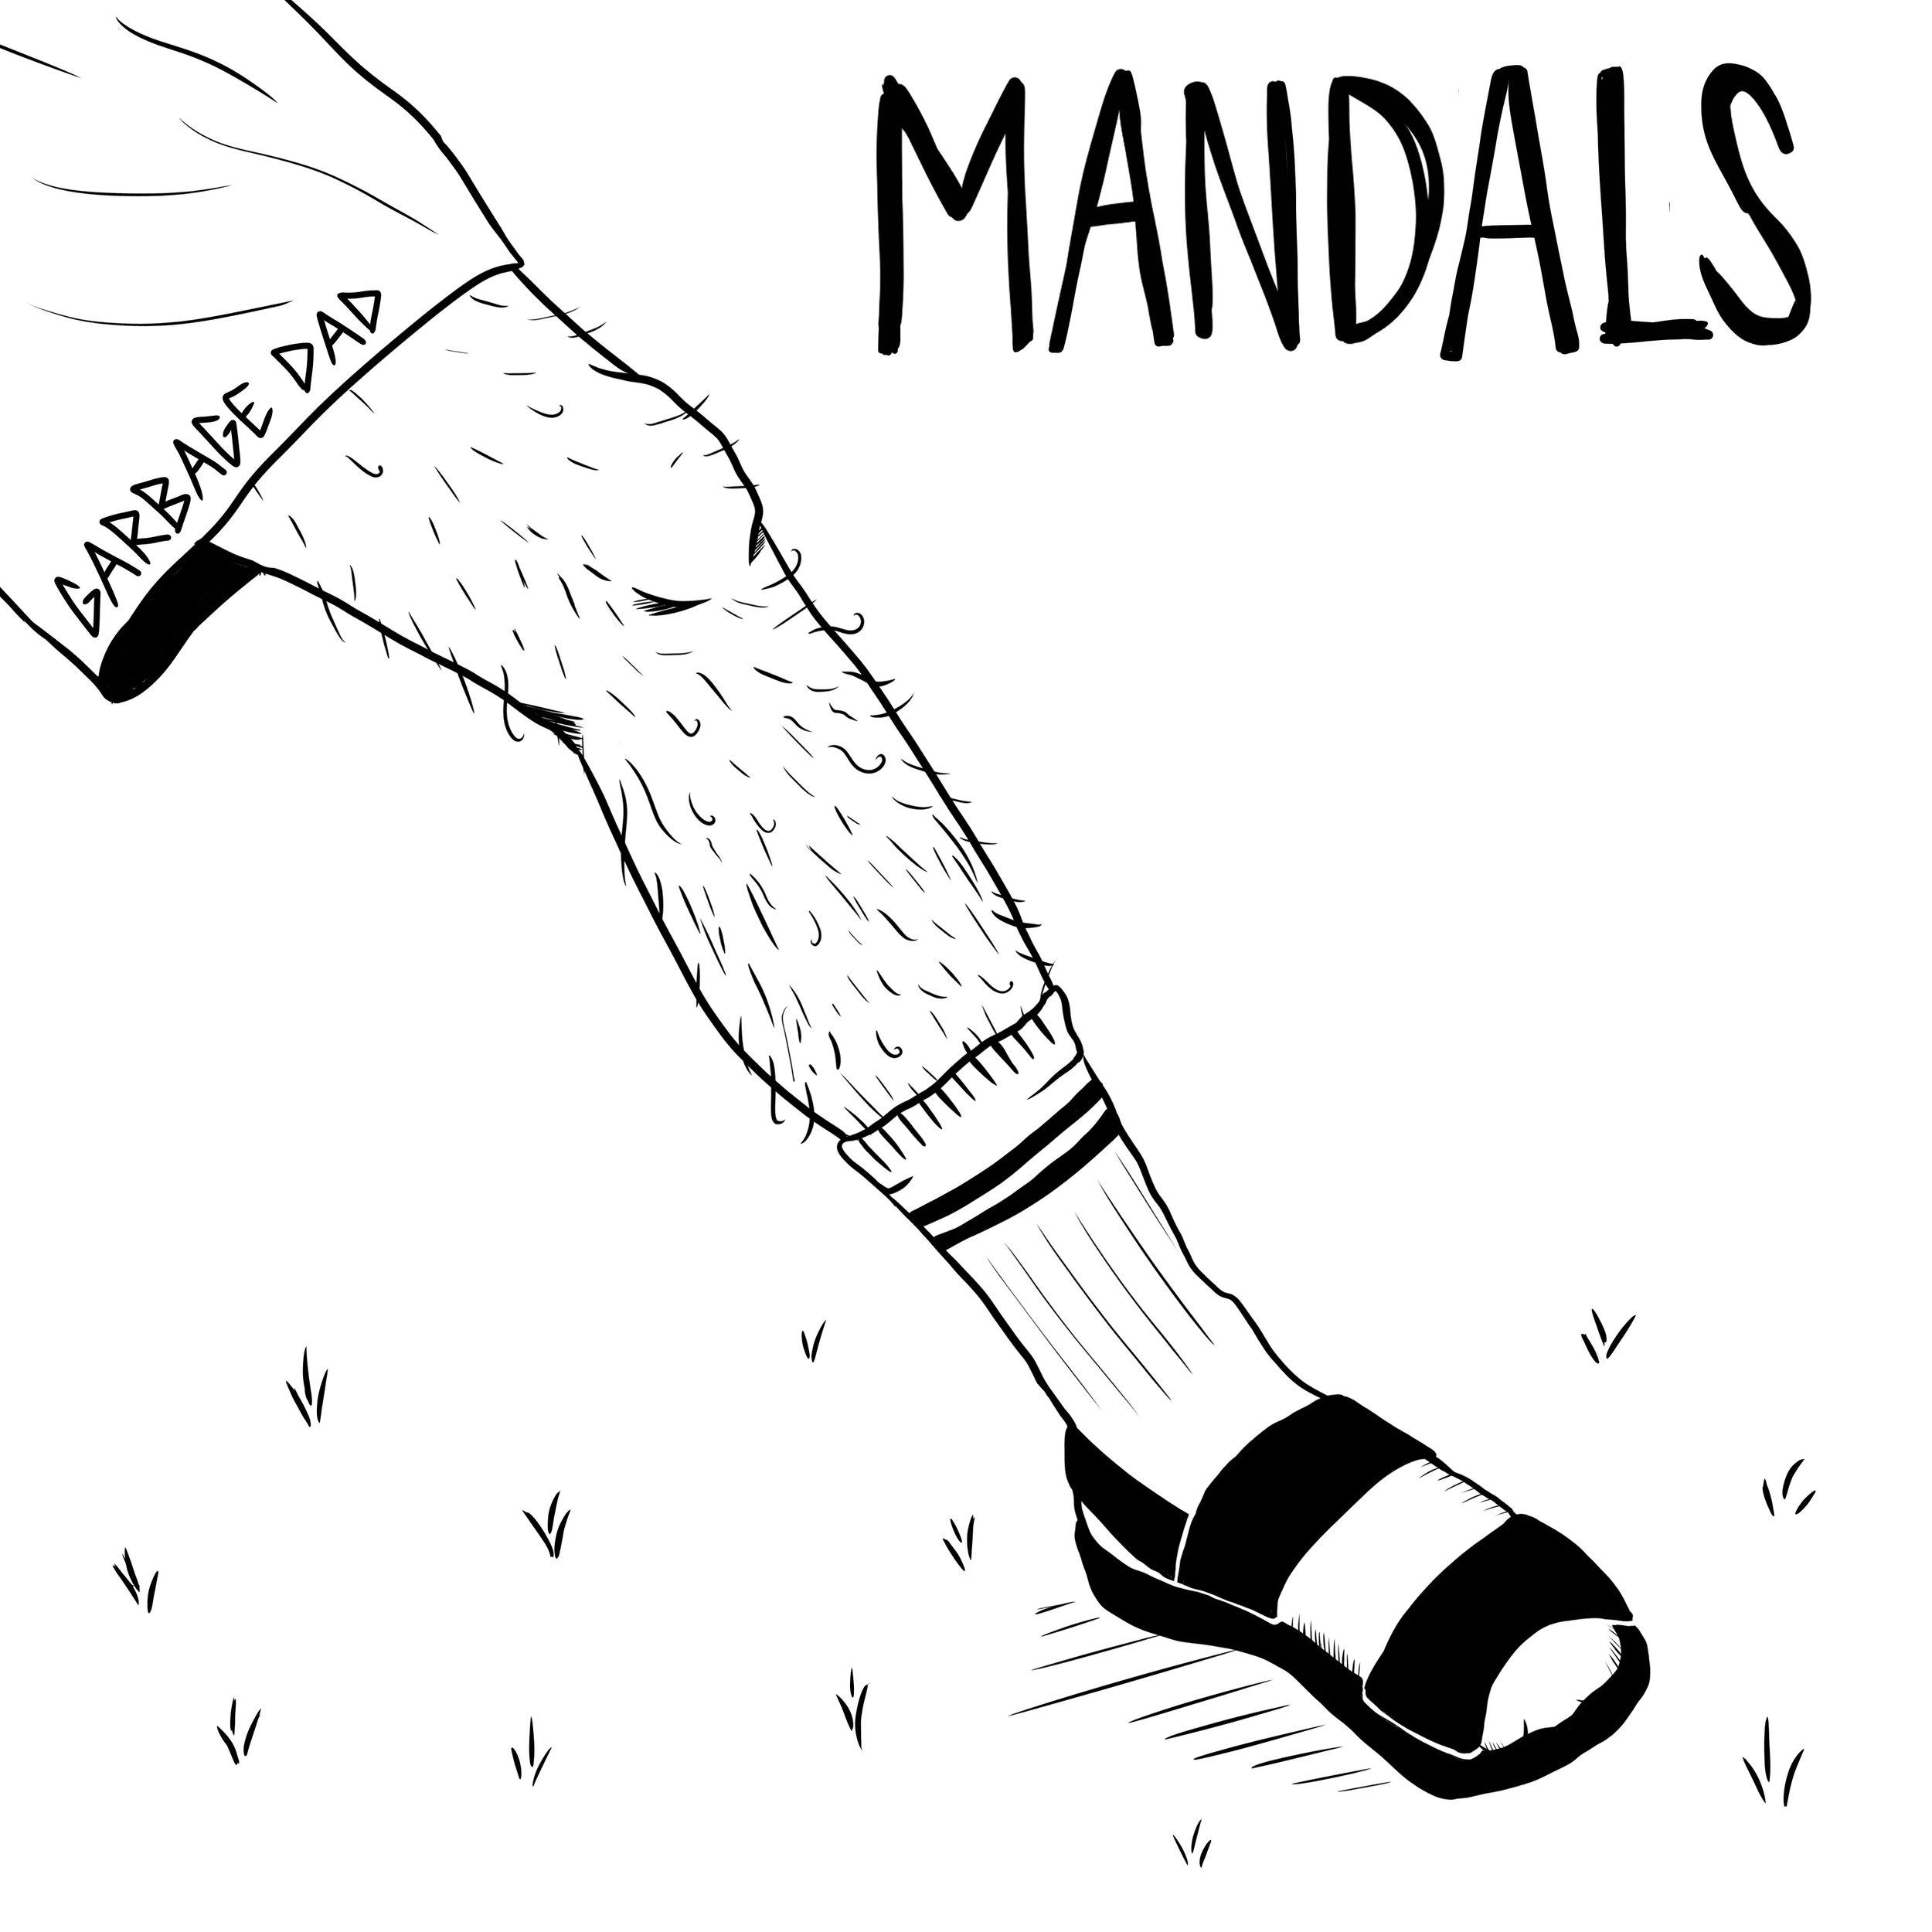 'Mandals' EP Artwork by Veronica Mitrano